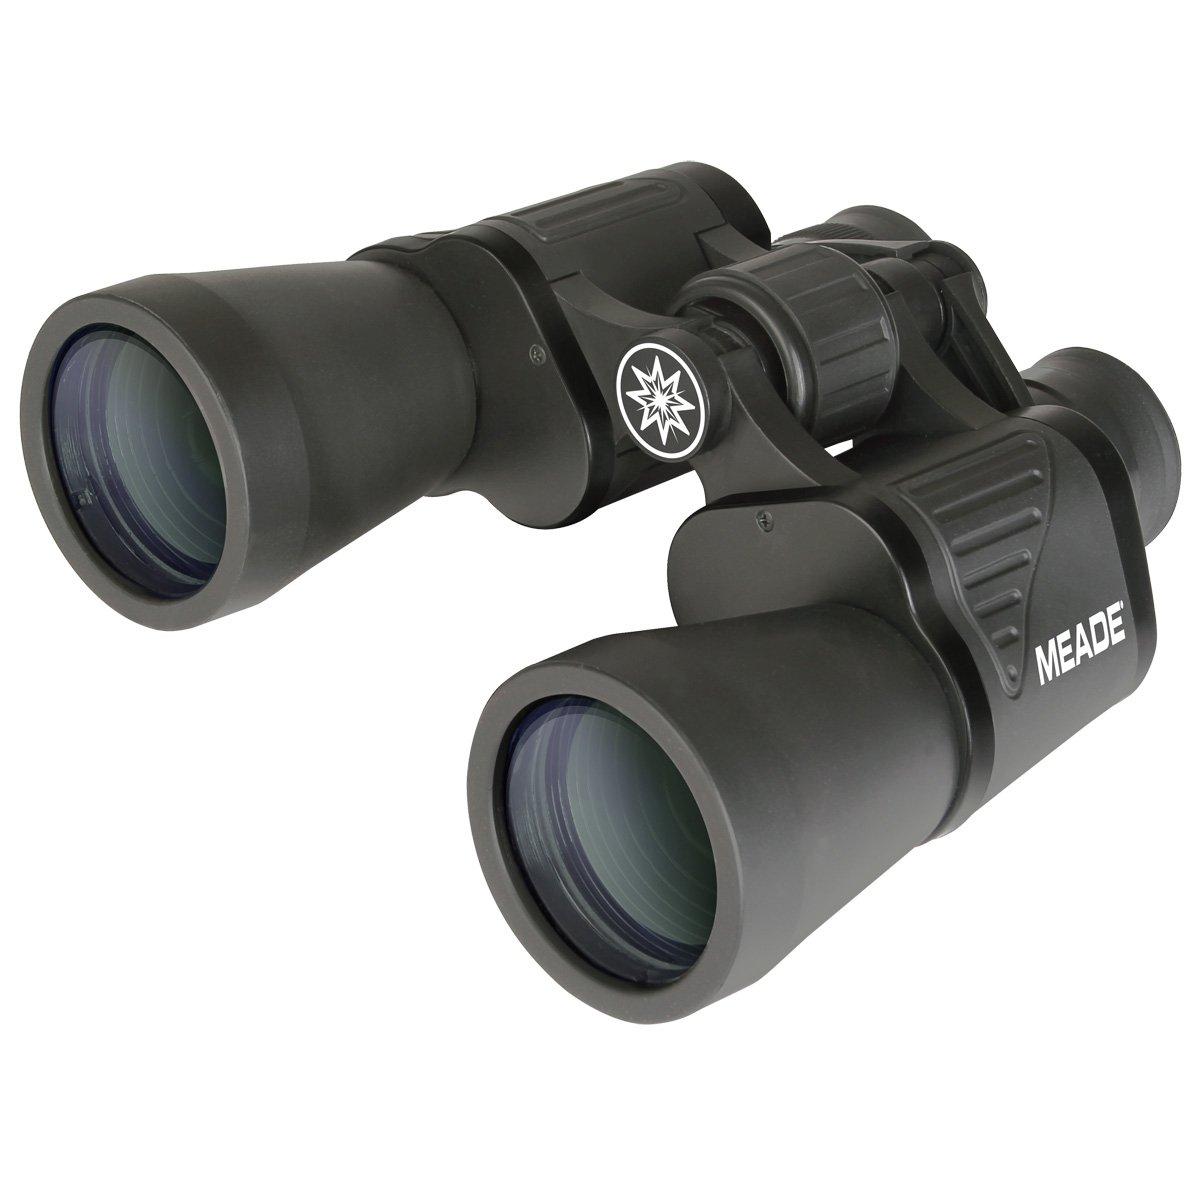 Binoculares 10x, 5 cm, Porro, Negro, Revestimiento C , 5,8/° Meade Instruments TravelView Binocular Porro Negro